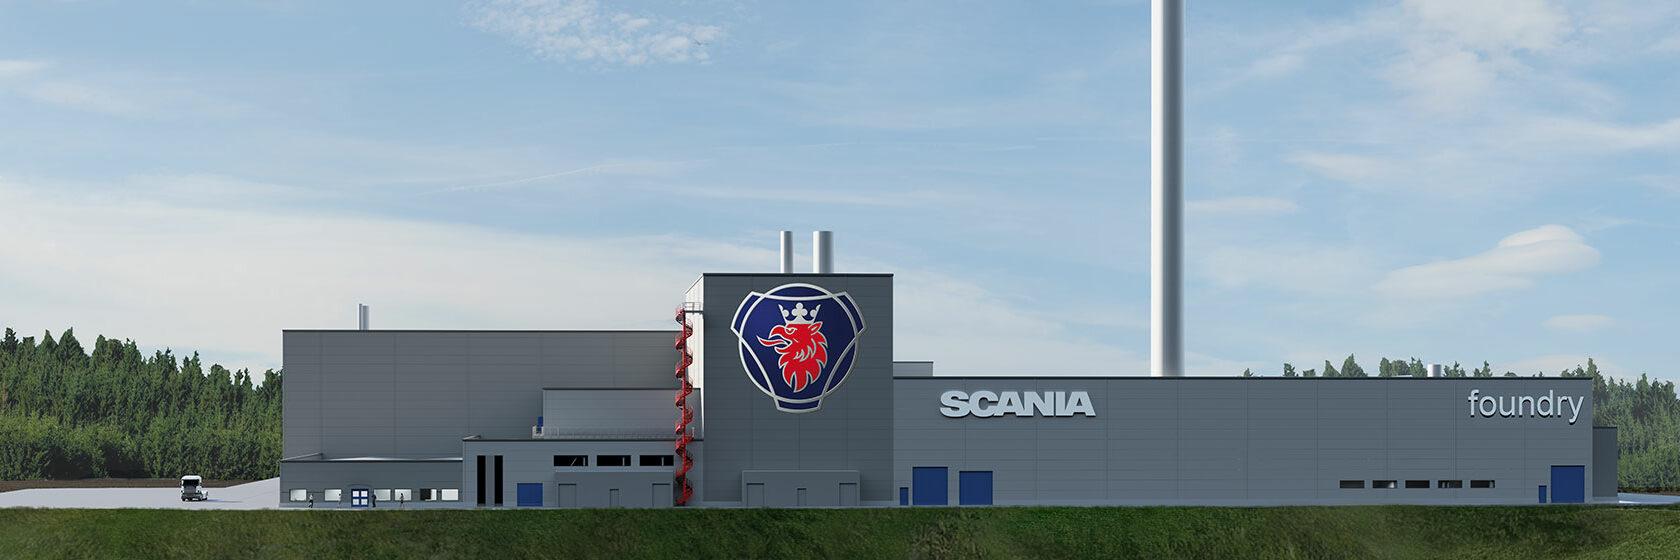 Scanias nya gjuterifabrik framifrån